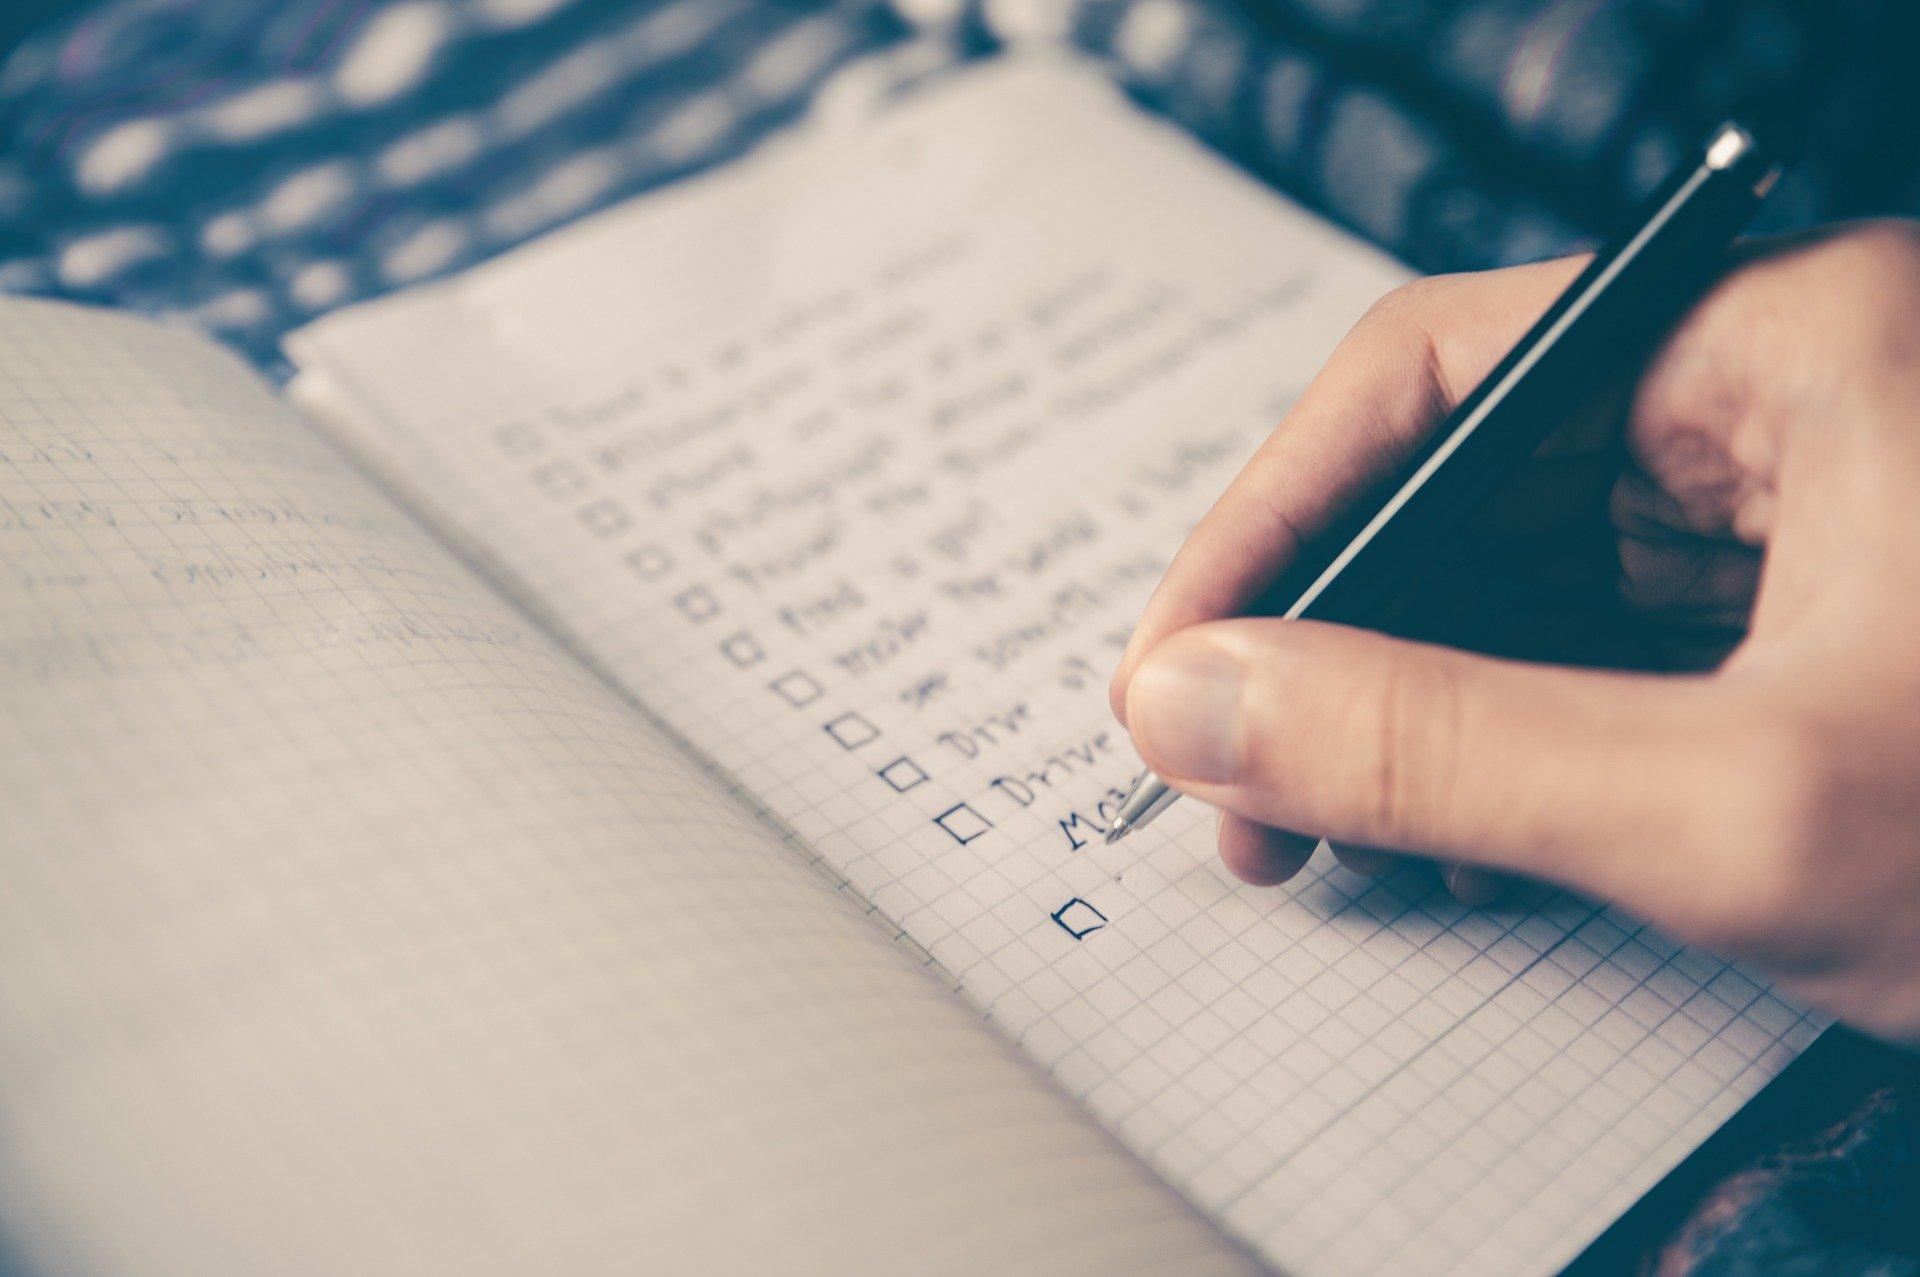 Pen and checklist